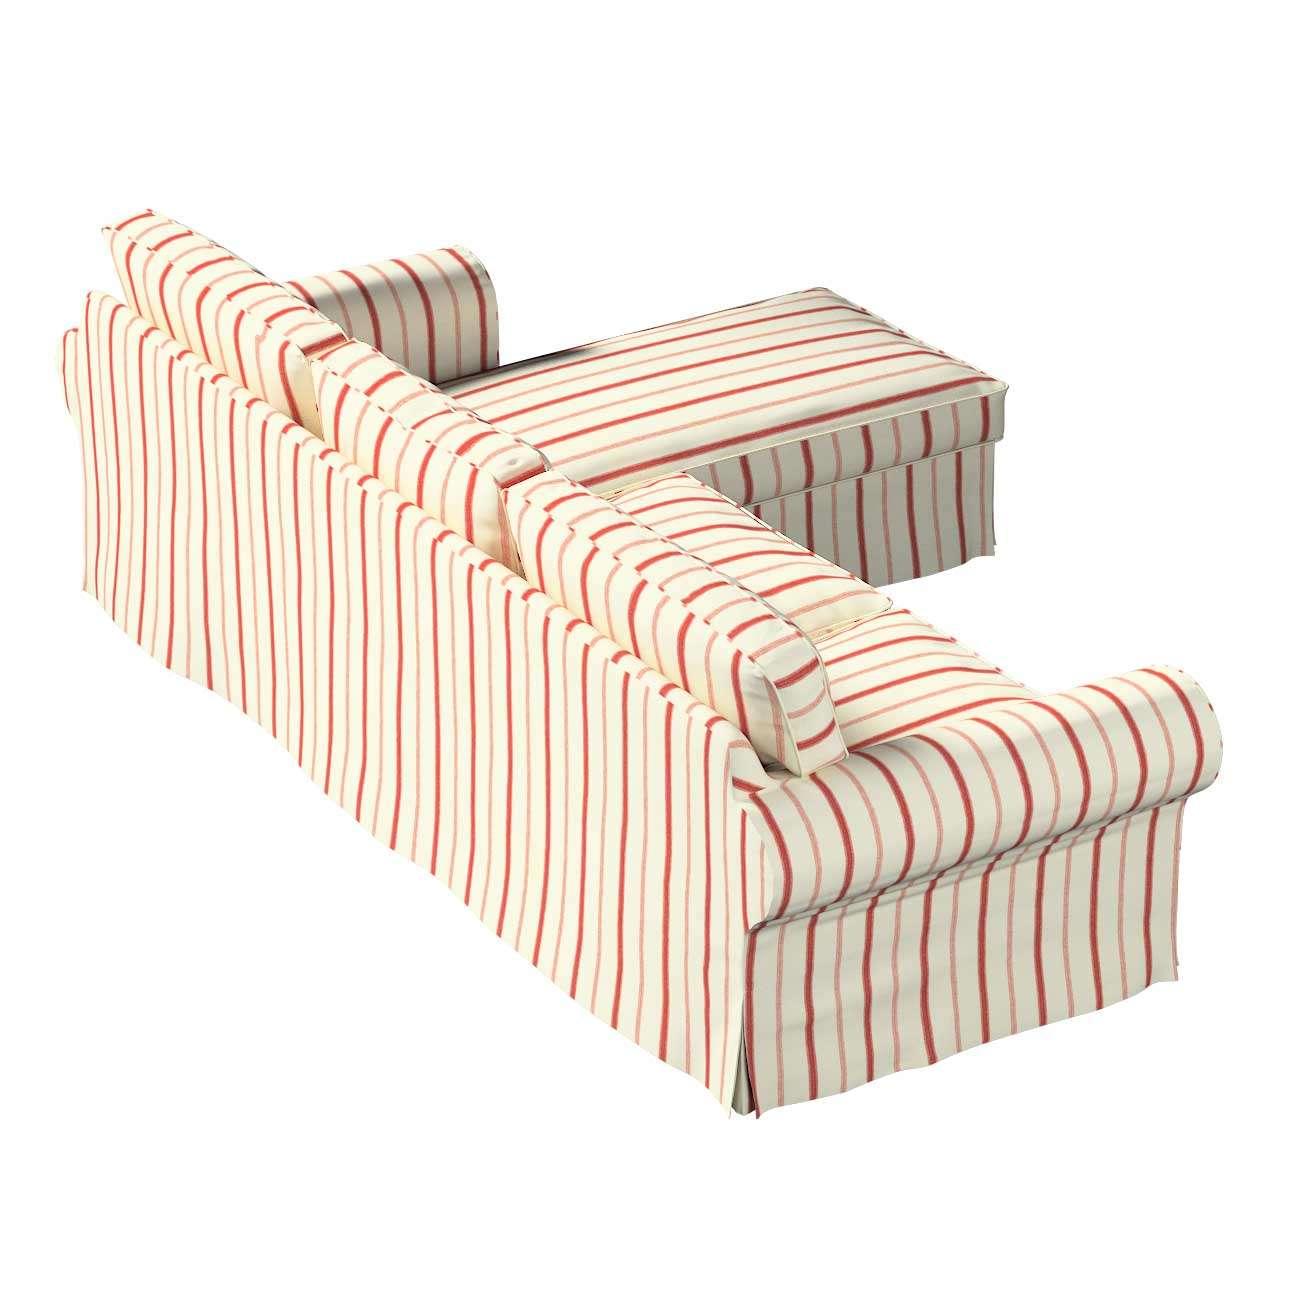 Potah na pohovku IKEA Ektorp 2-místná se šezlongem sofa ektorp 2-0s. i leżanka v kolekci Avignon, látka: 129-15